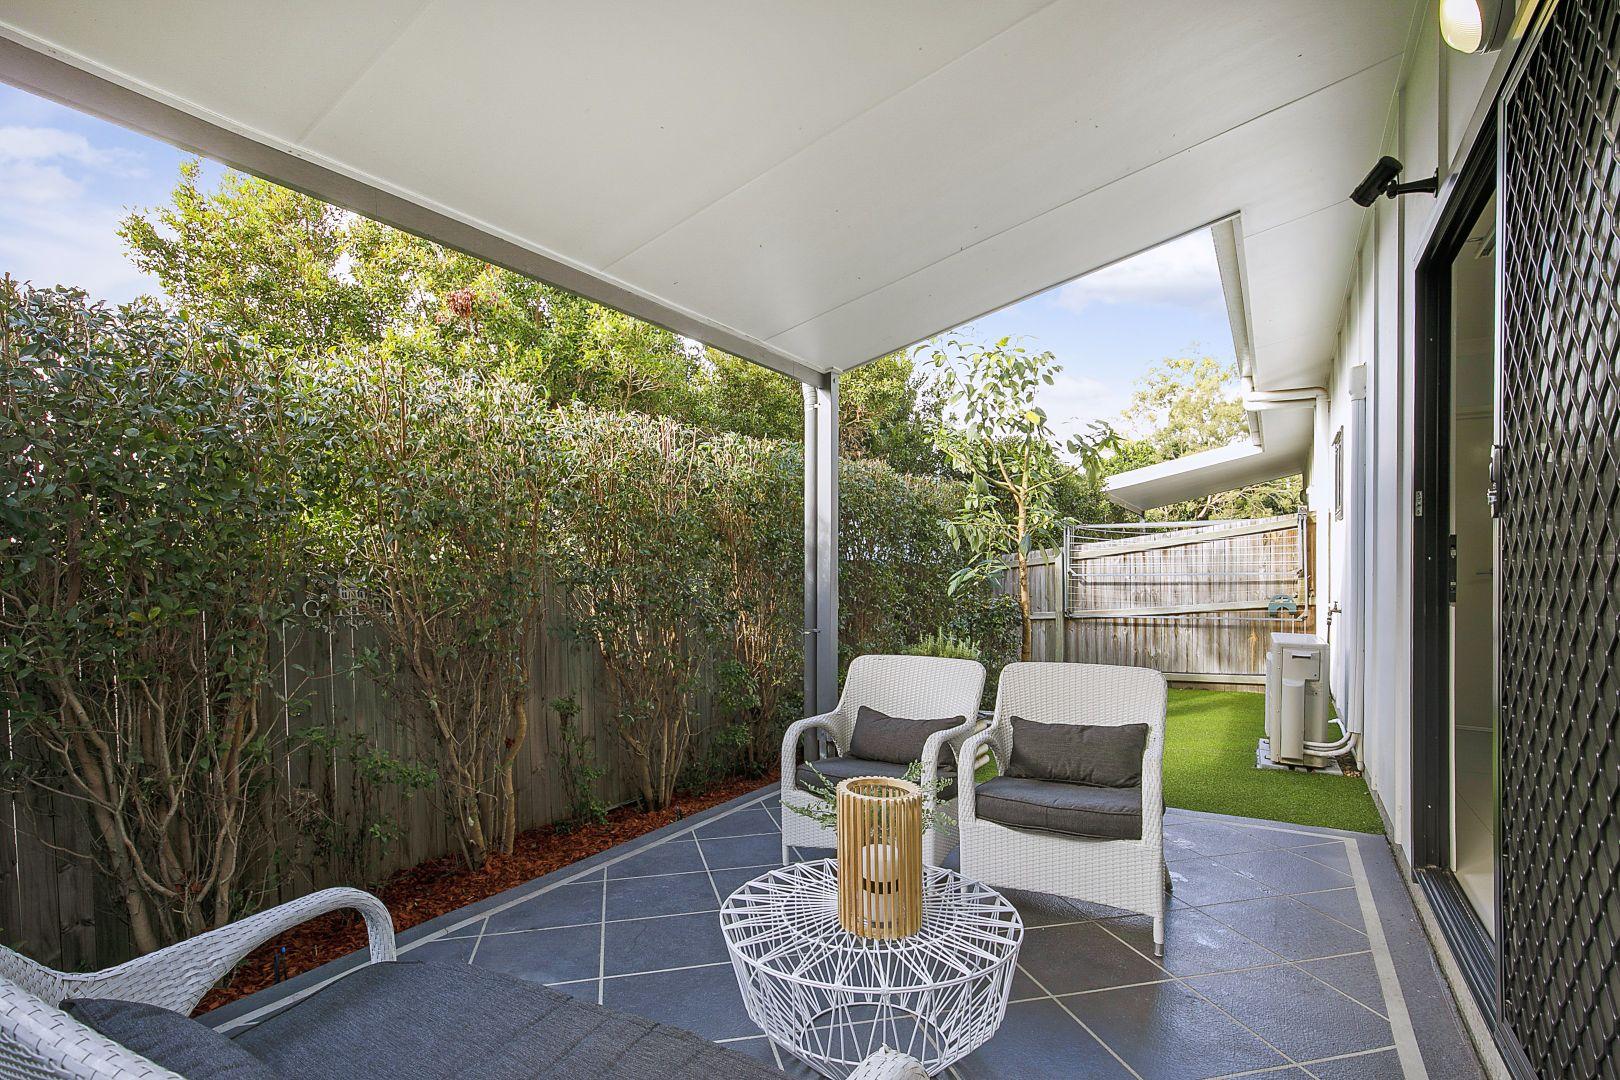 2/39 Dickenson Street, Carina QLD 4152, Image 1